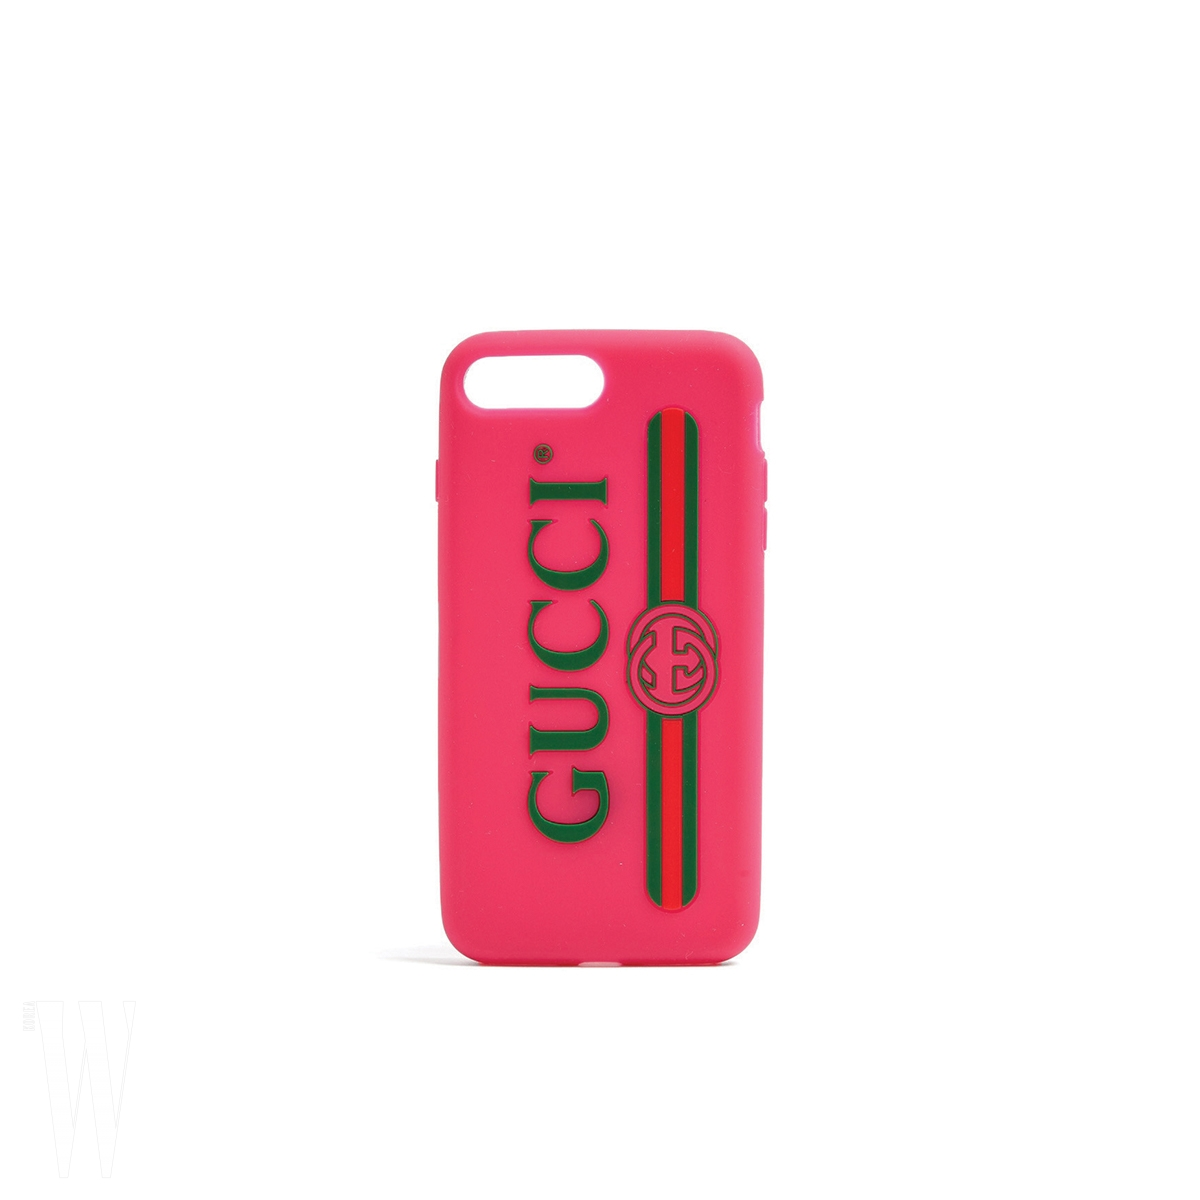 GUCCI 로고 장식 핸드폰 케이스는 구찌 제품. 28만원.